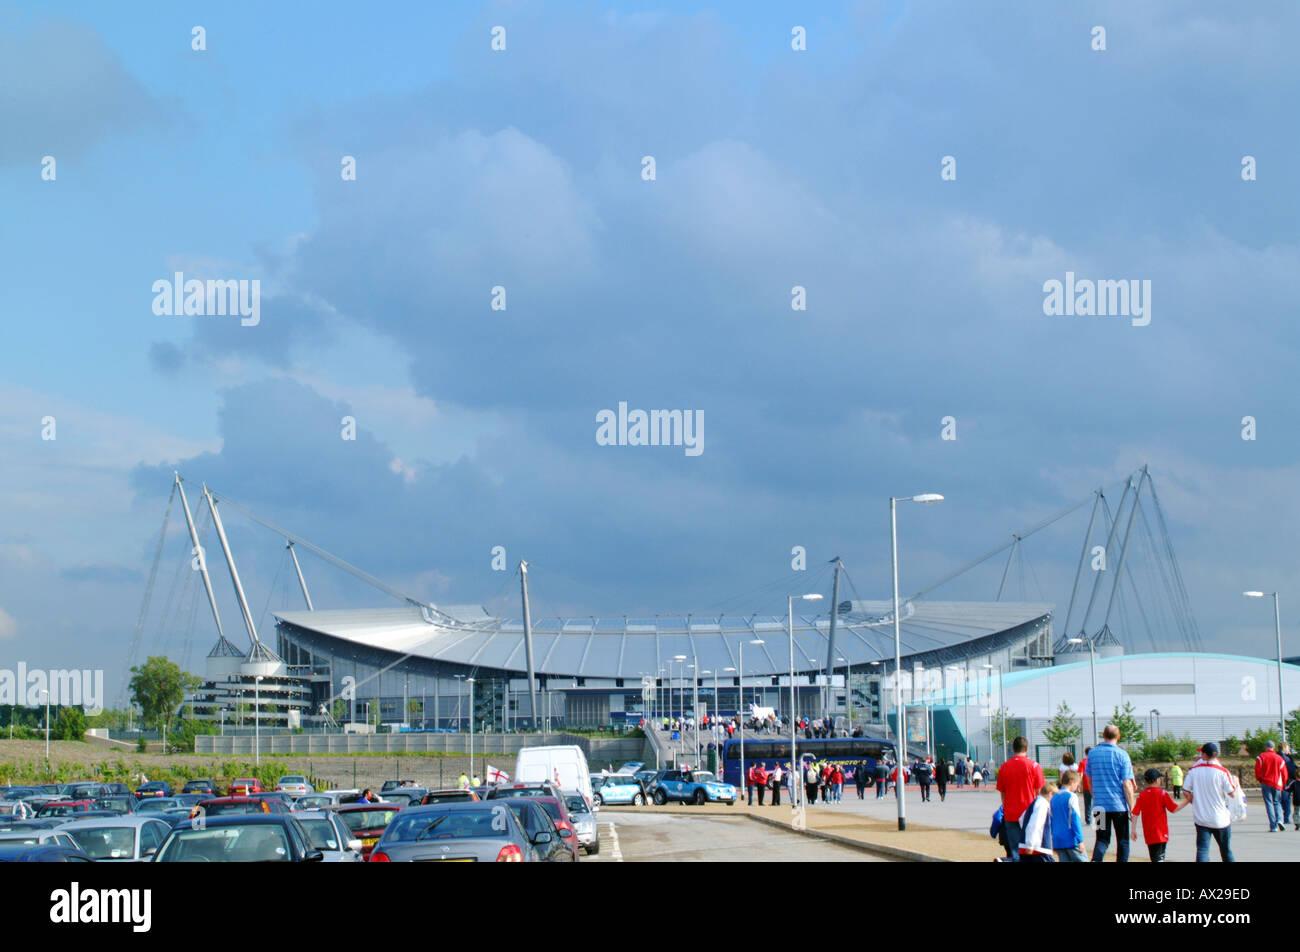 The city of manchester stadium - Stock Image